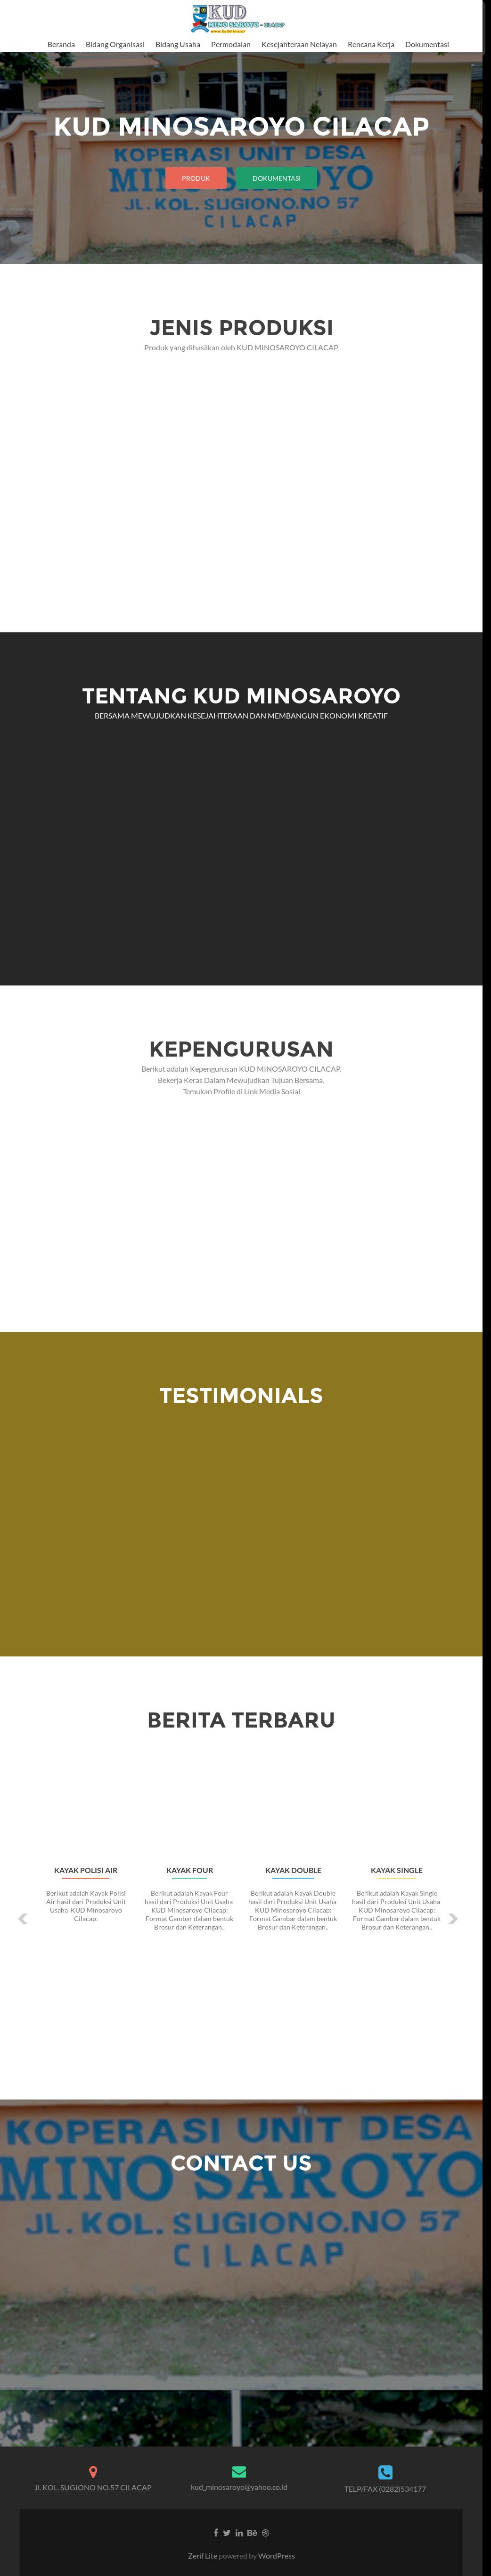 Kud Minosaroyo Competitors, Revenue and Employees - Owler Company